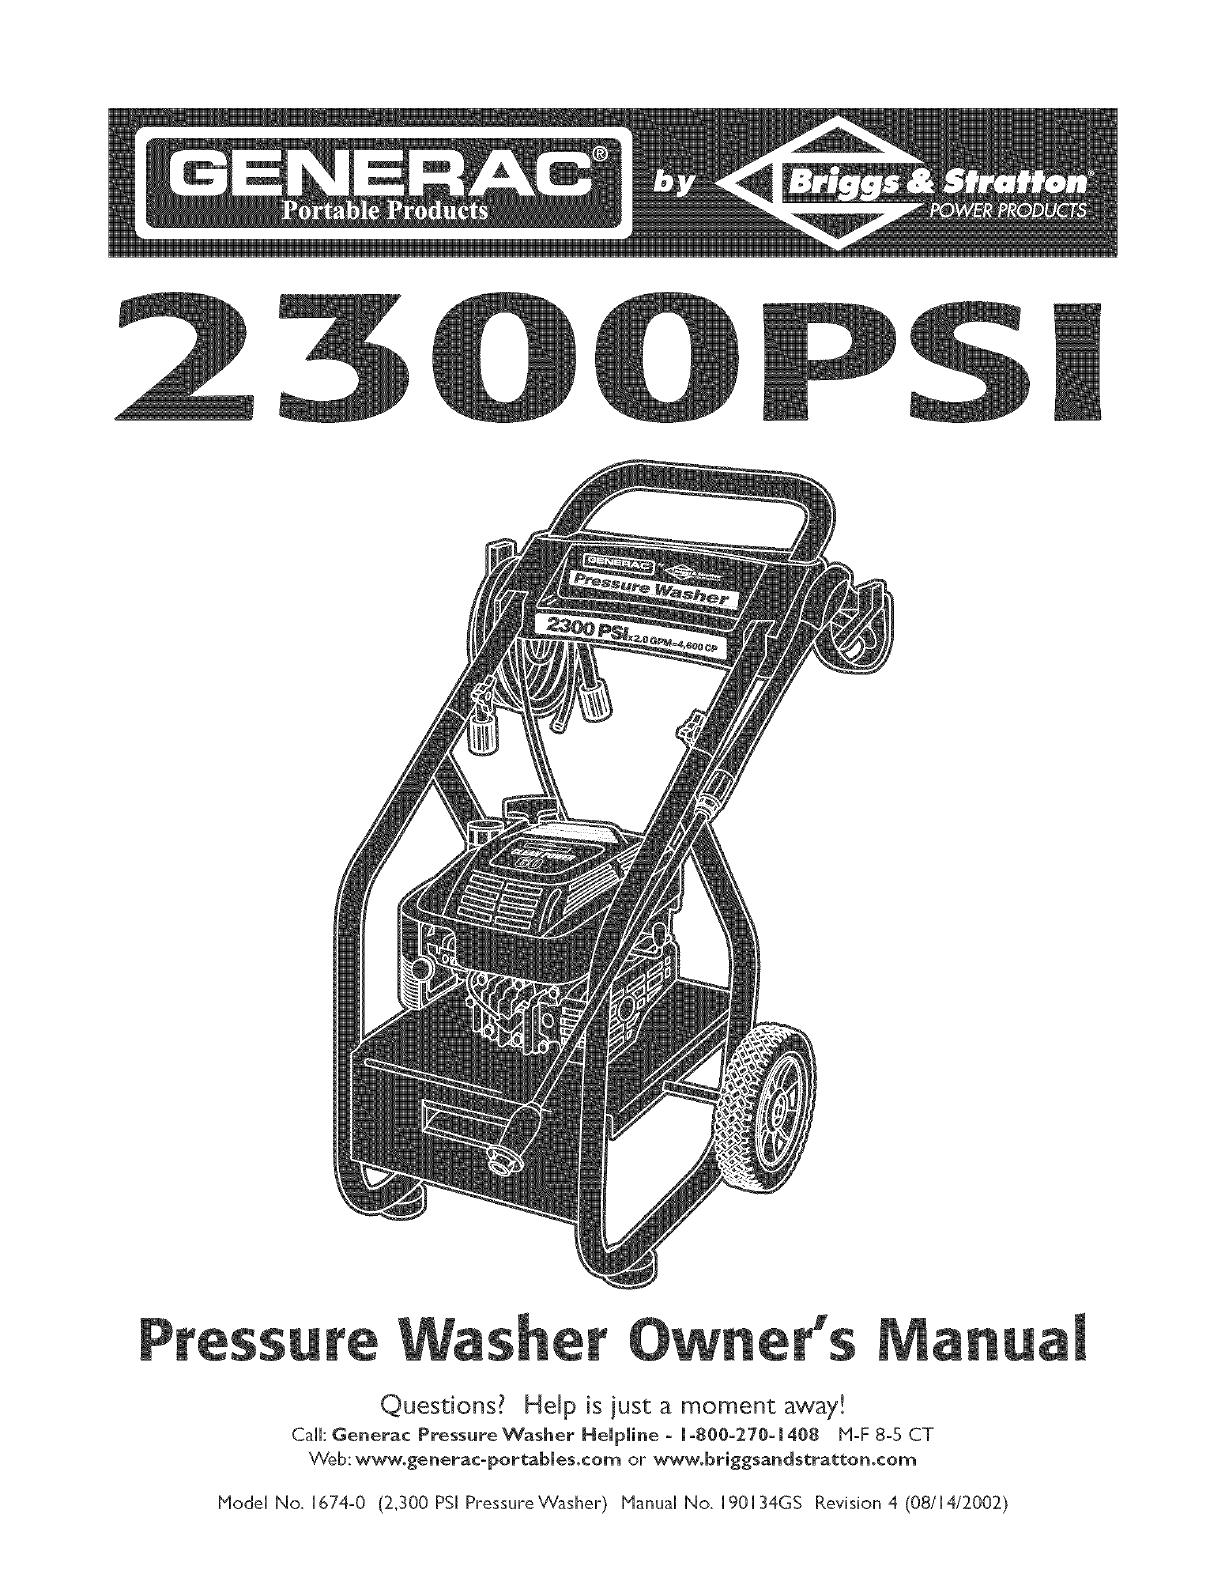 Generac 1674 0 User Manual PRESSURE WASHER Manuals And Guides L0505107UserManual.wiki